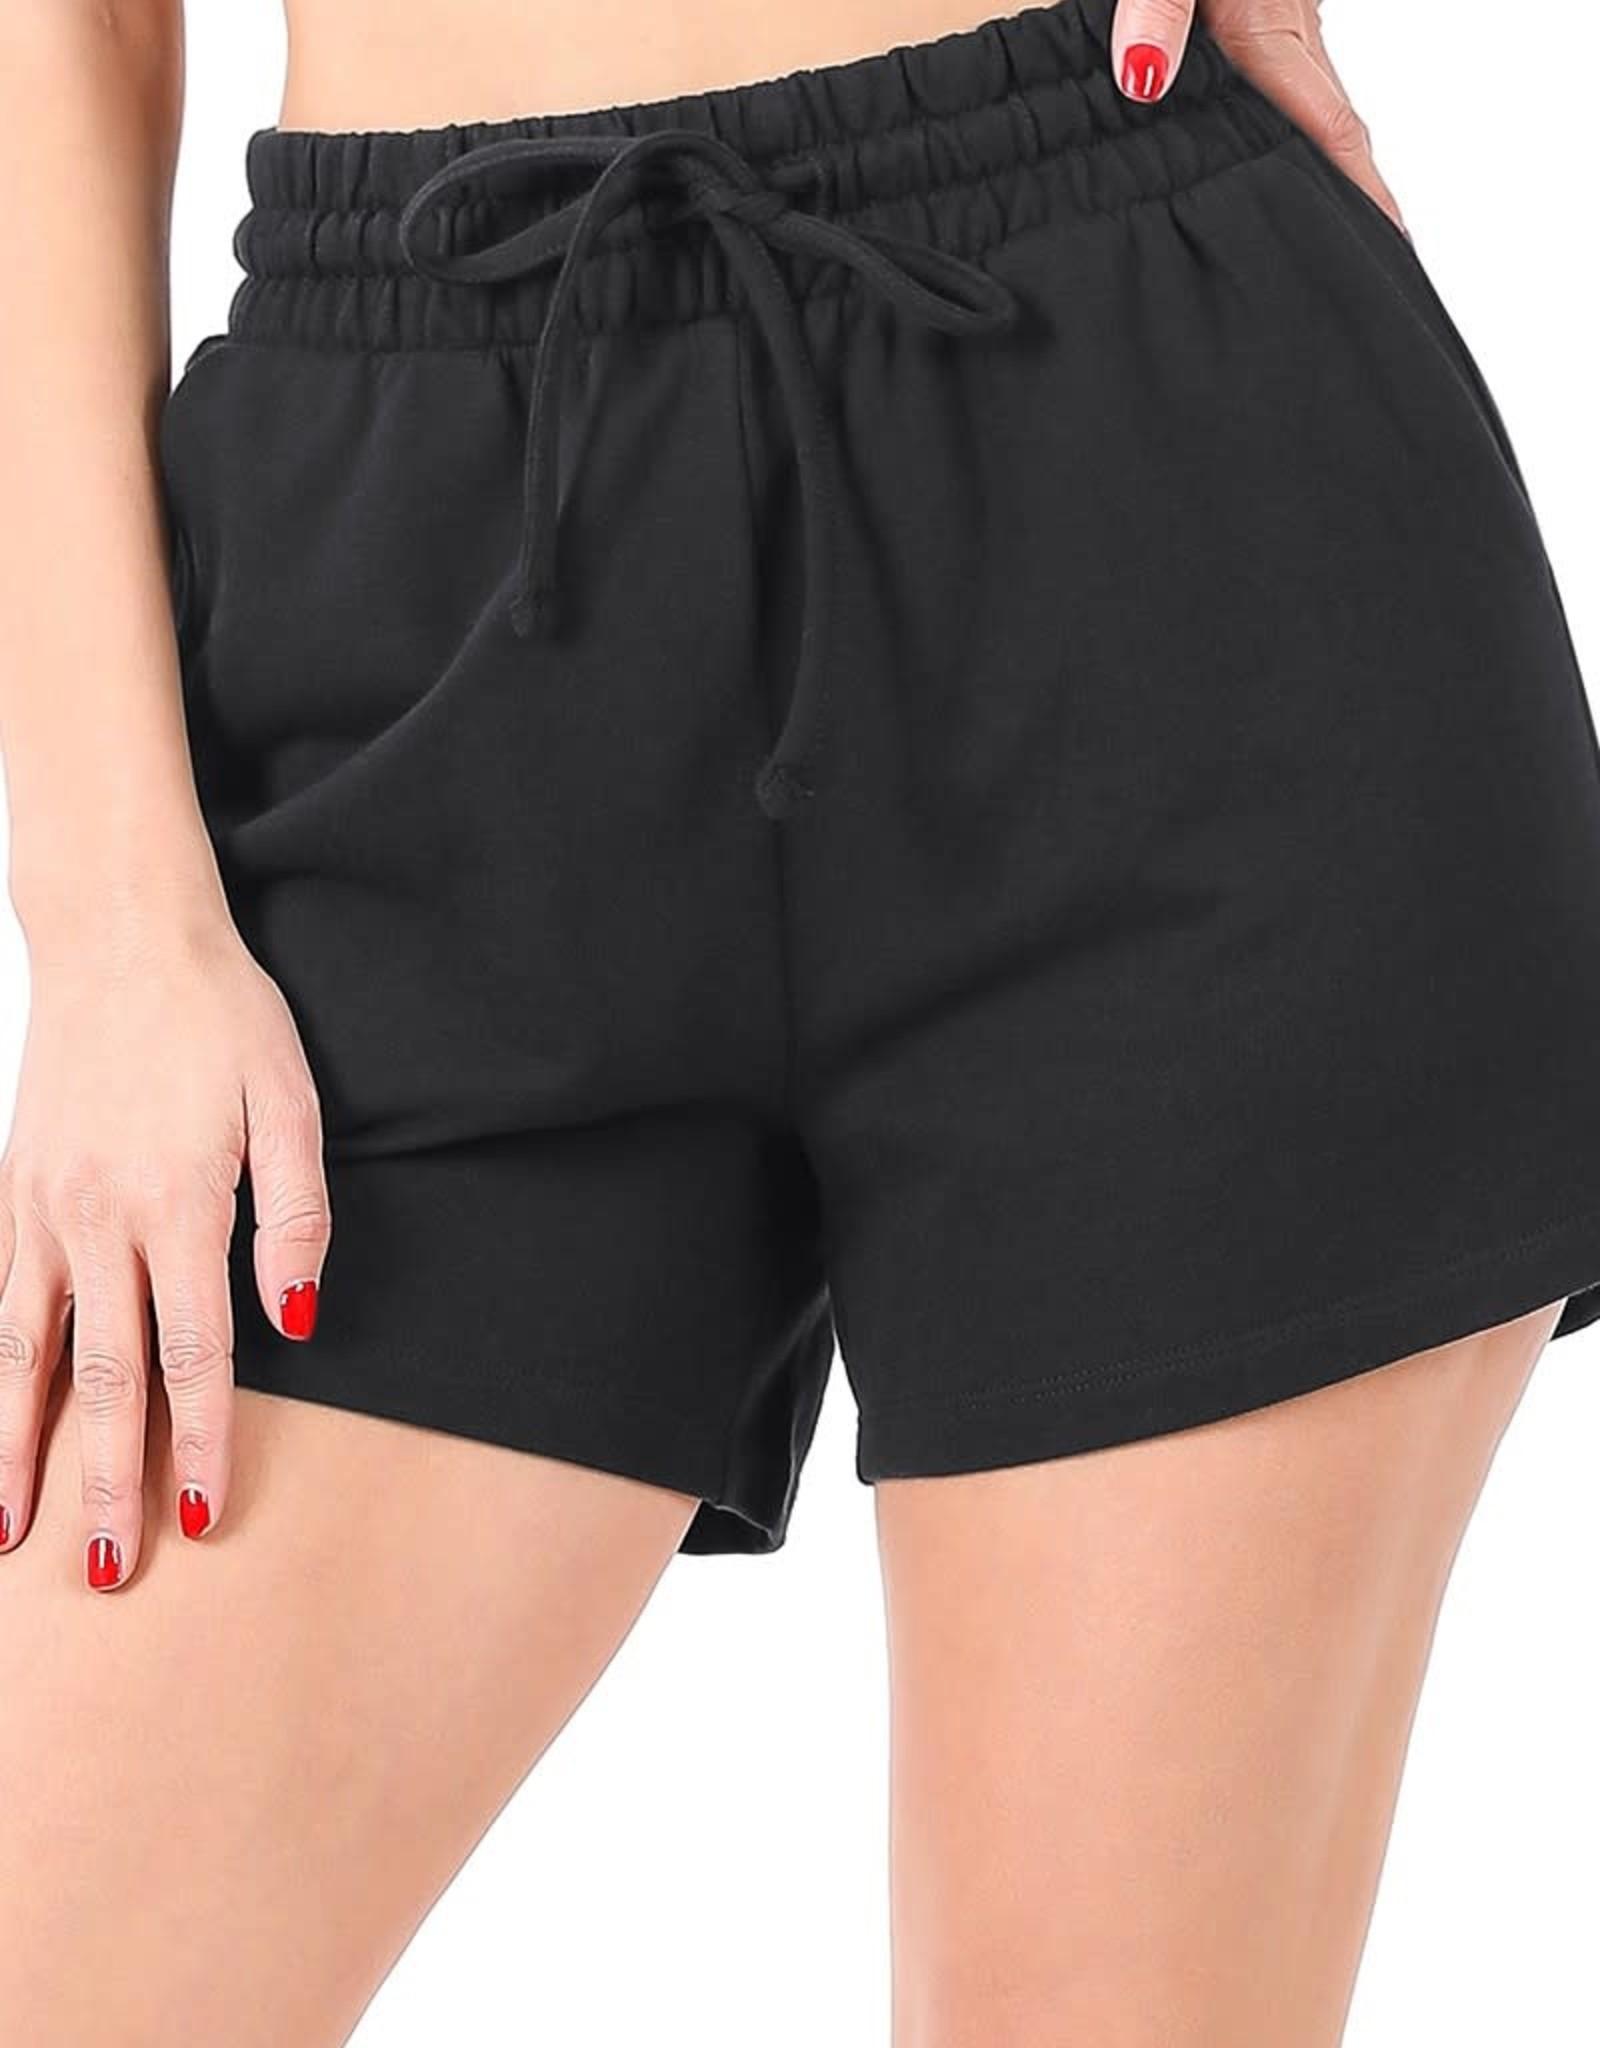 Miss Bliss French Terry Drawstring Shorts- Black